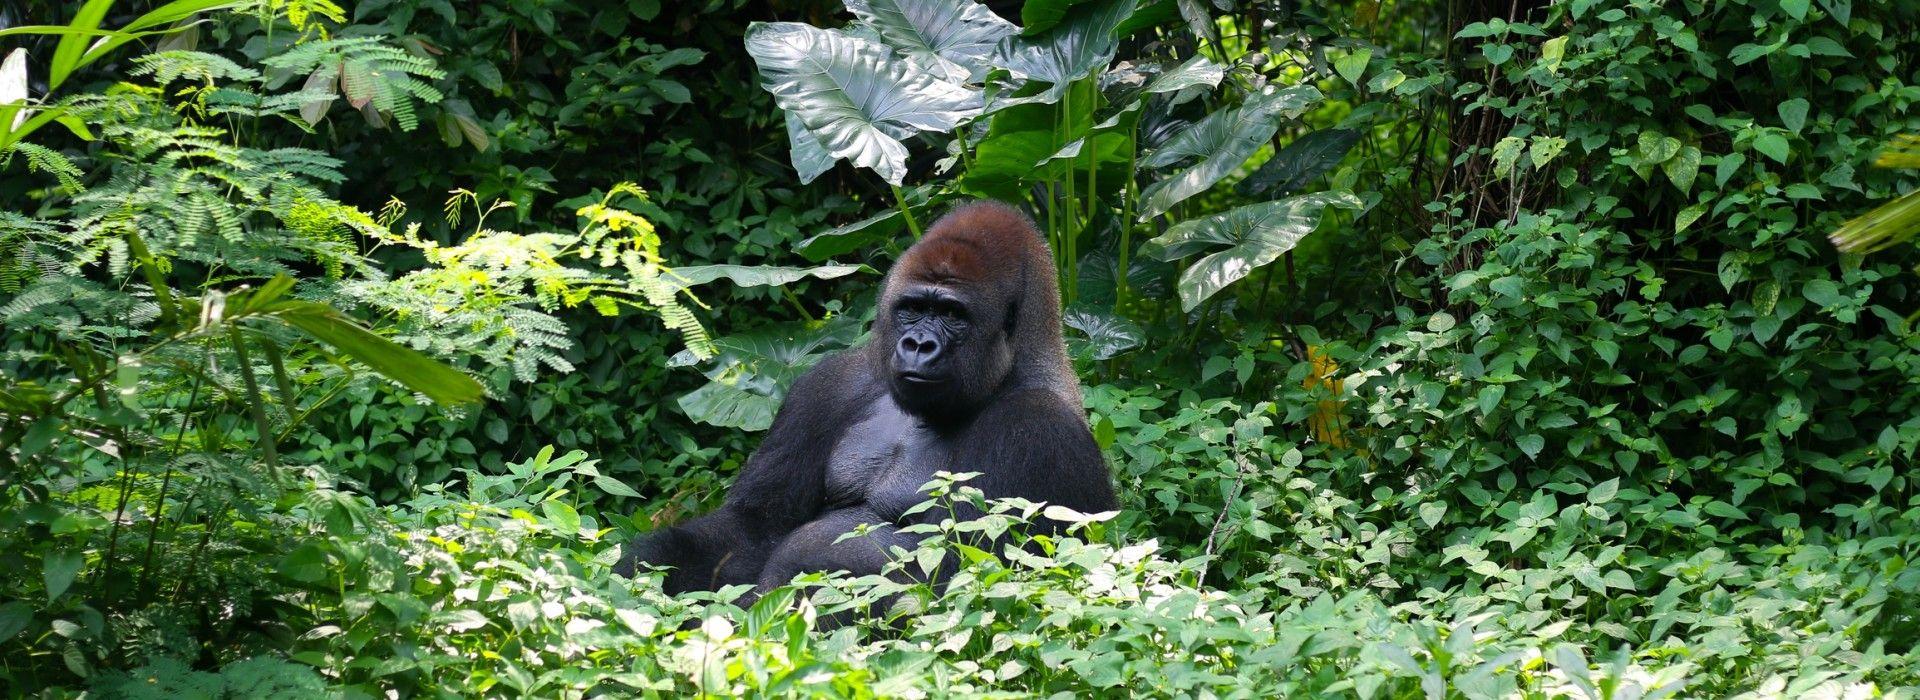 Gorilla and chimpanzee tracking Tours in Kigali